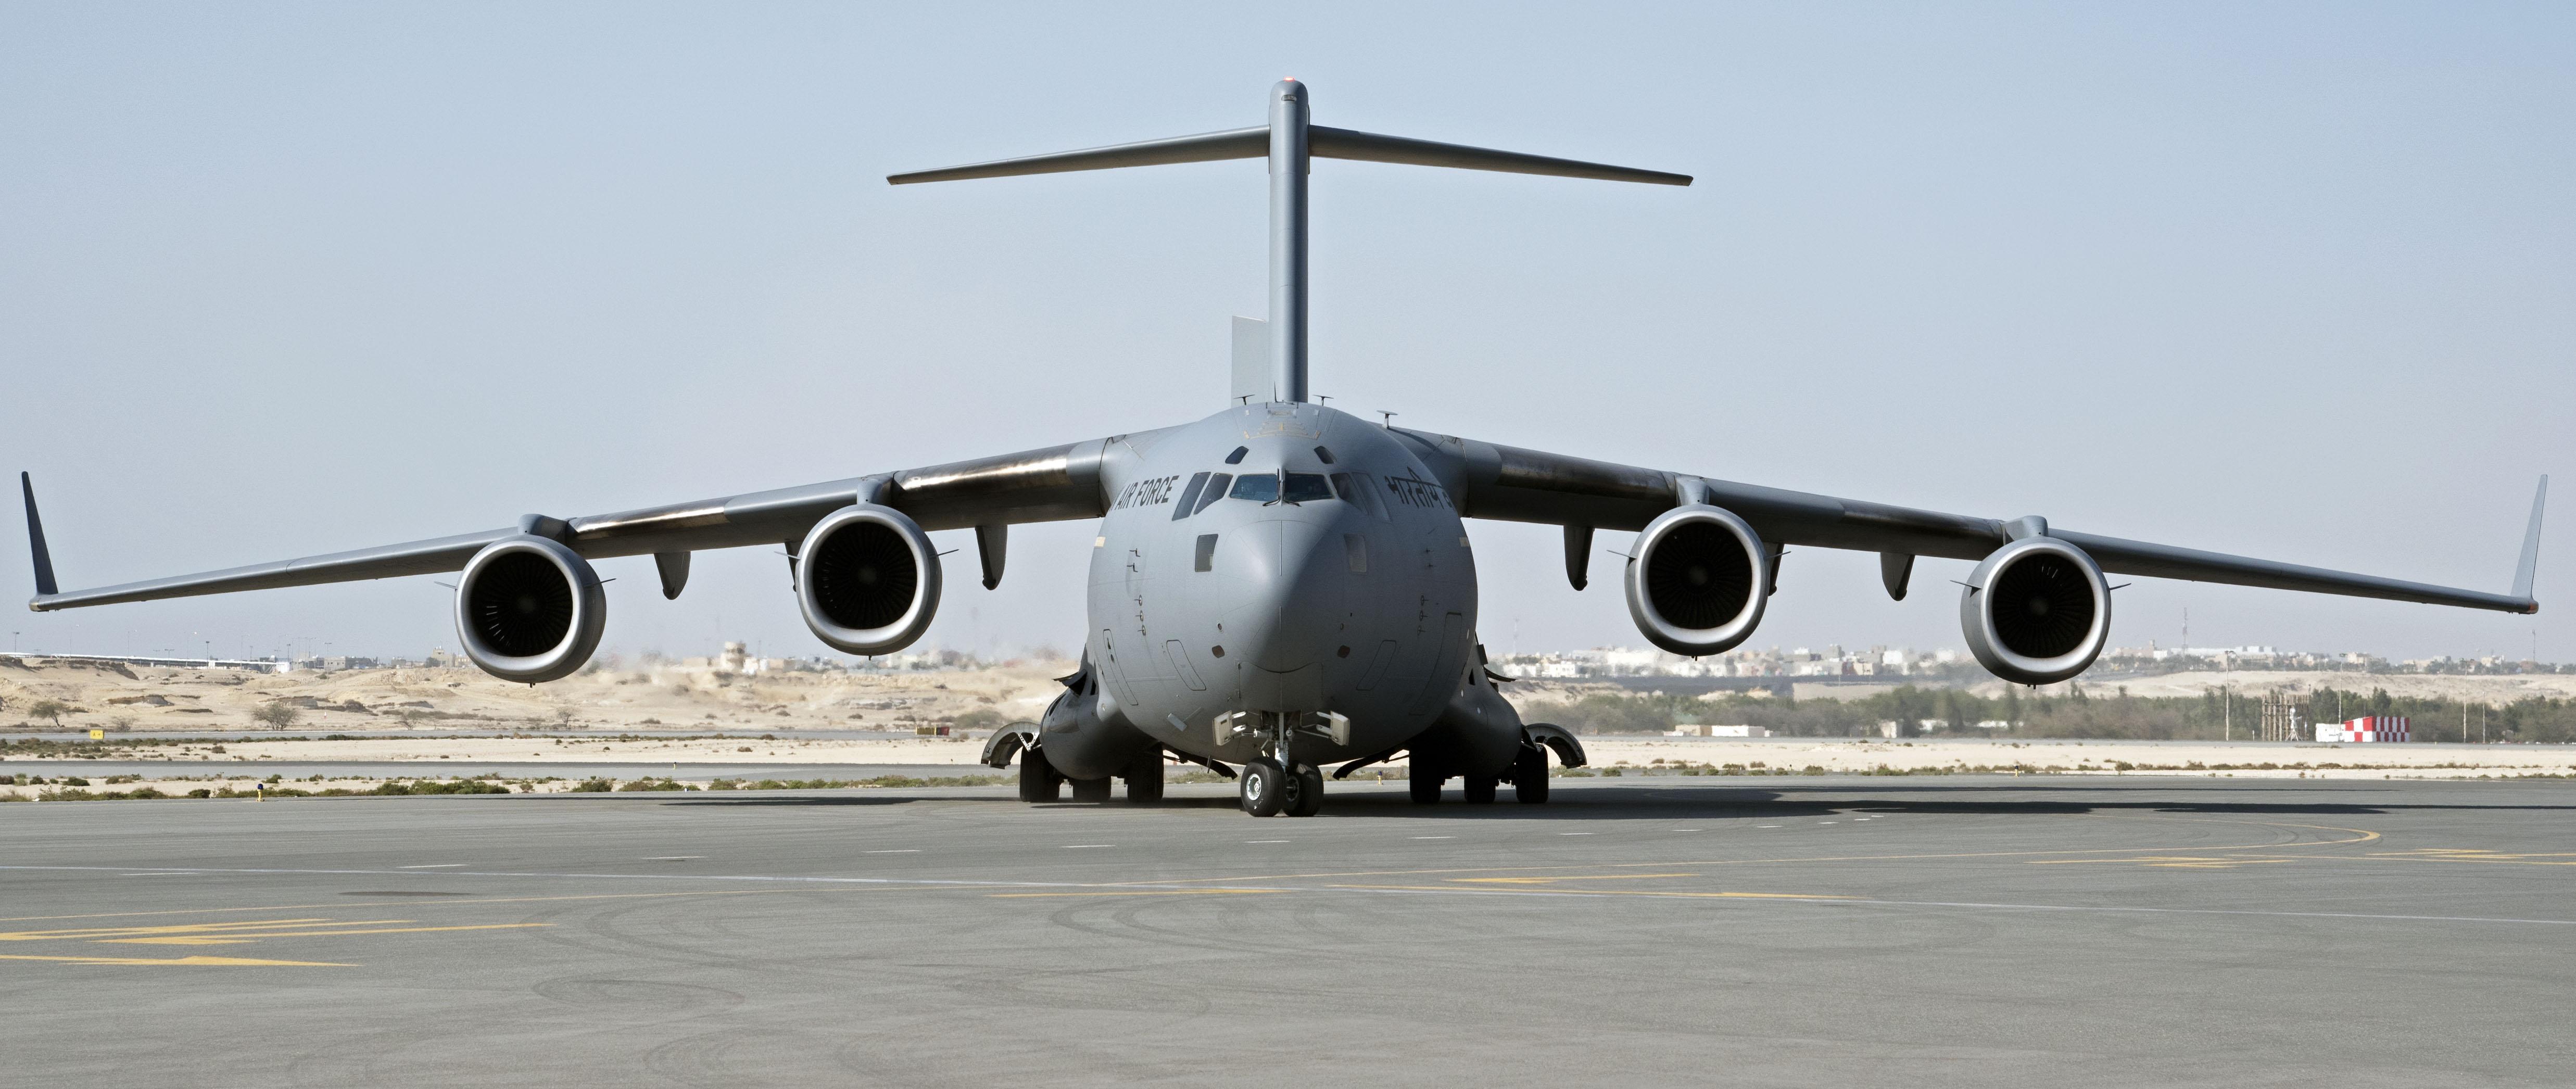 General 4948x2092 Boeing C-17 Globemaster III Indian Air Force warplanes